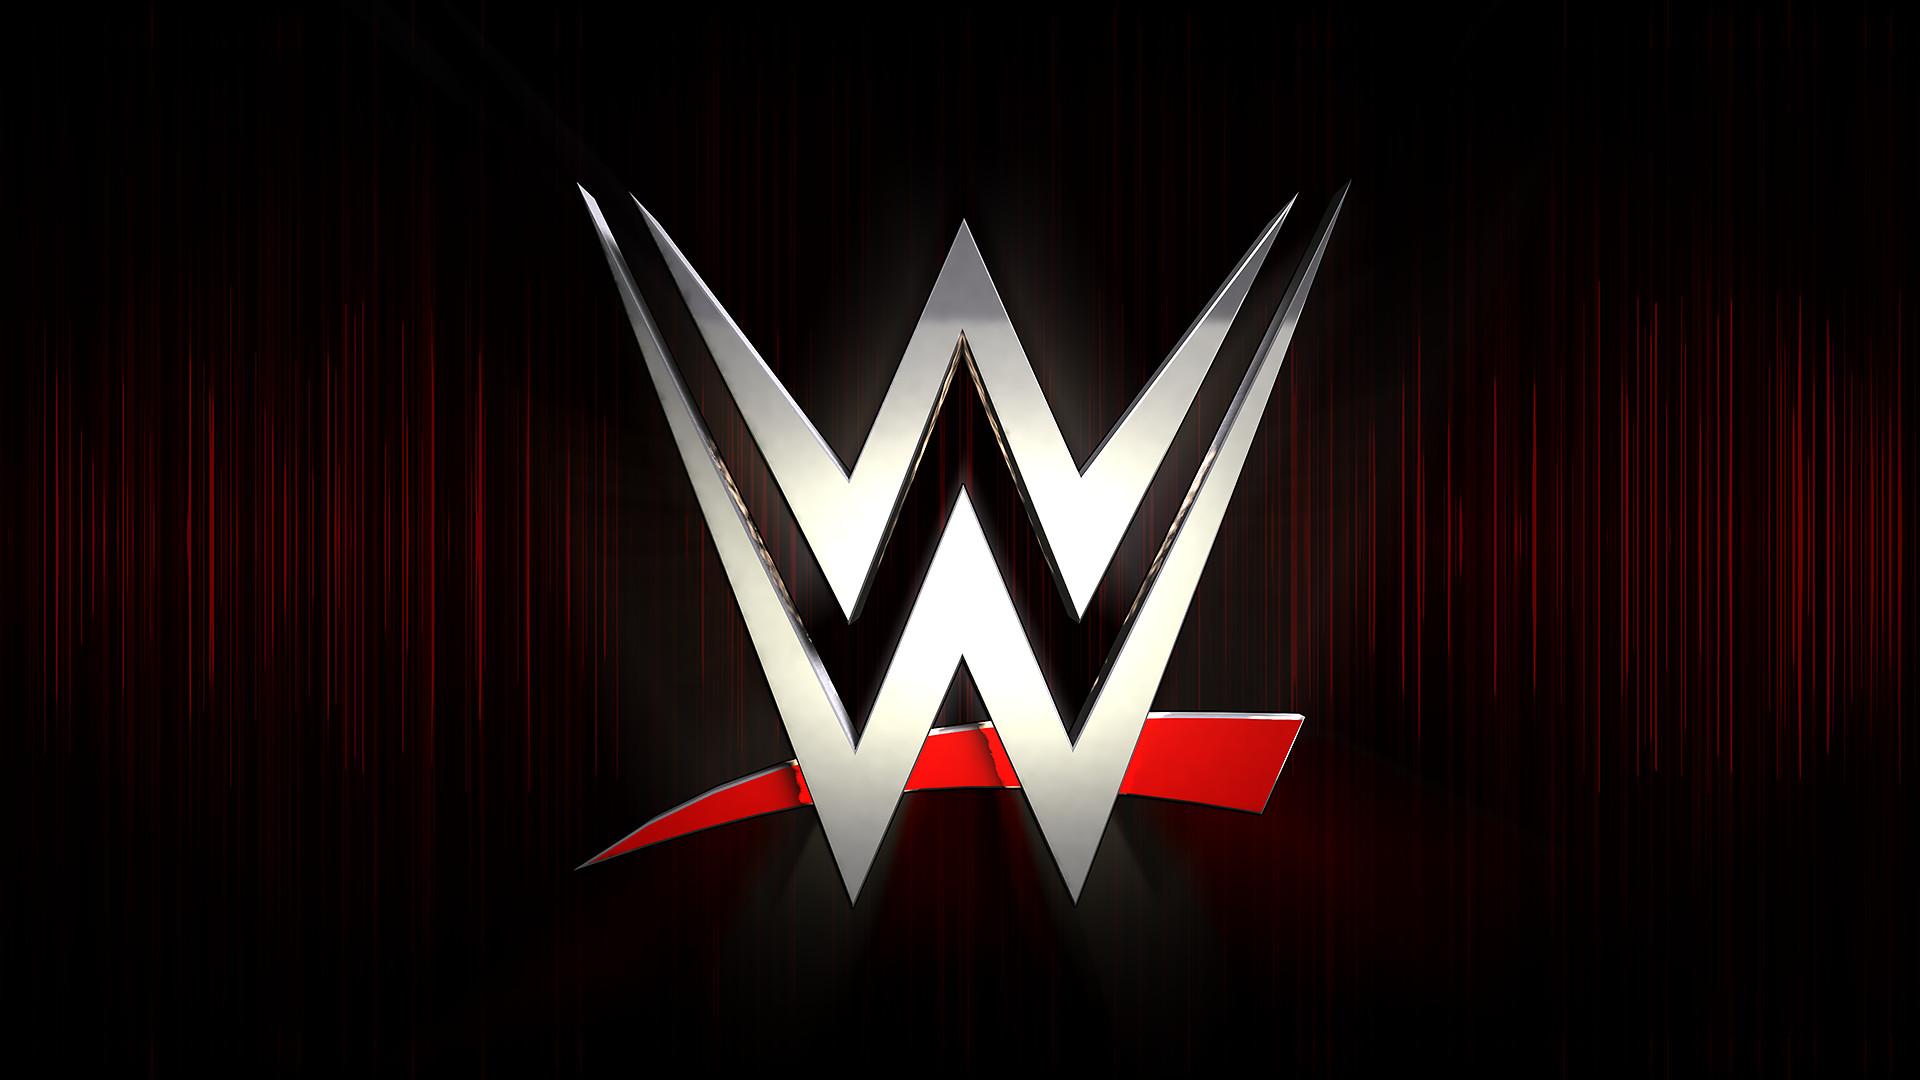 WWE HD Wallpapers Wallpaper   HD Wallpapers   Pinterest   Hd wallpaper,  Wallpaper and Wallpaper free download